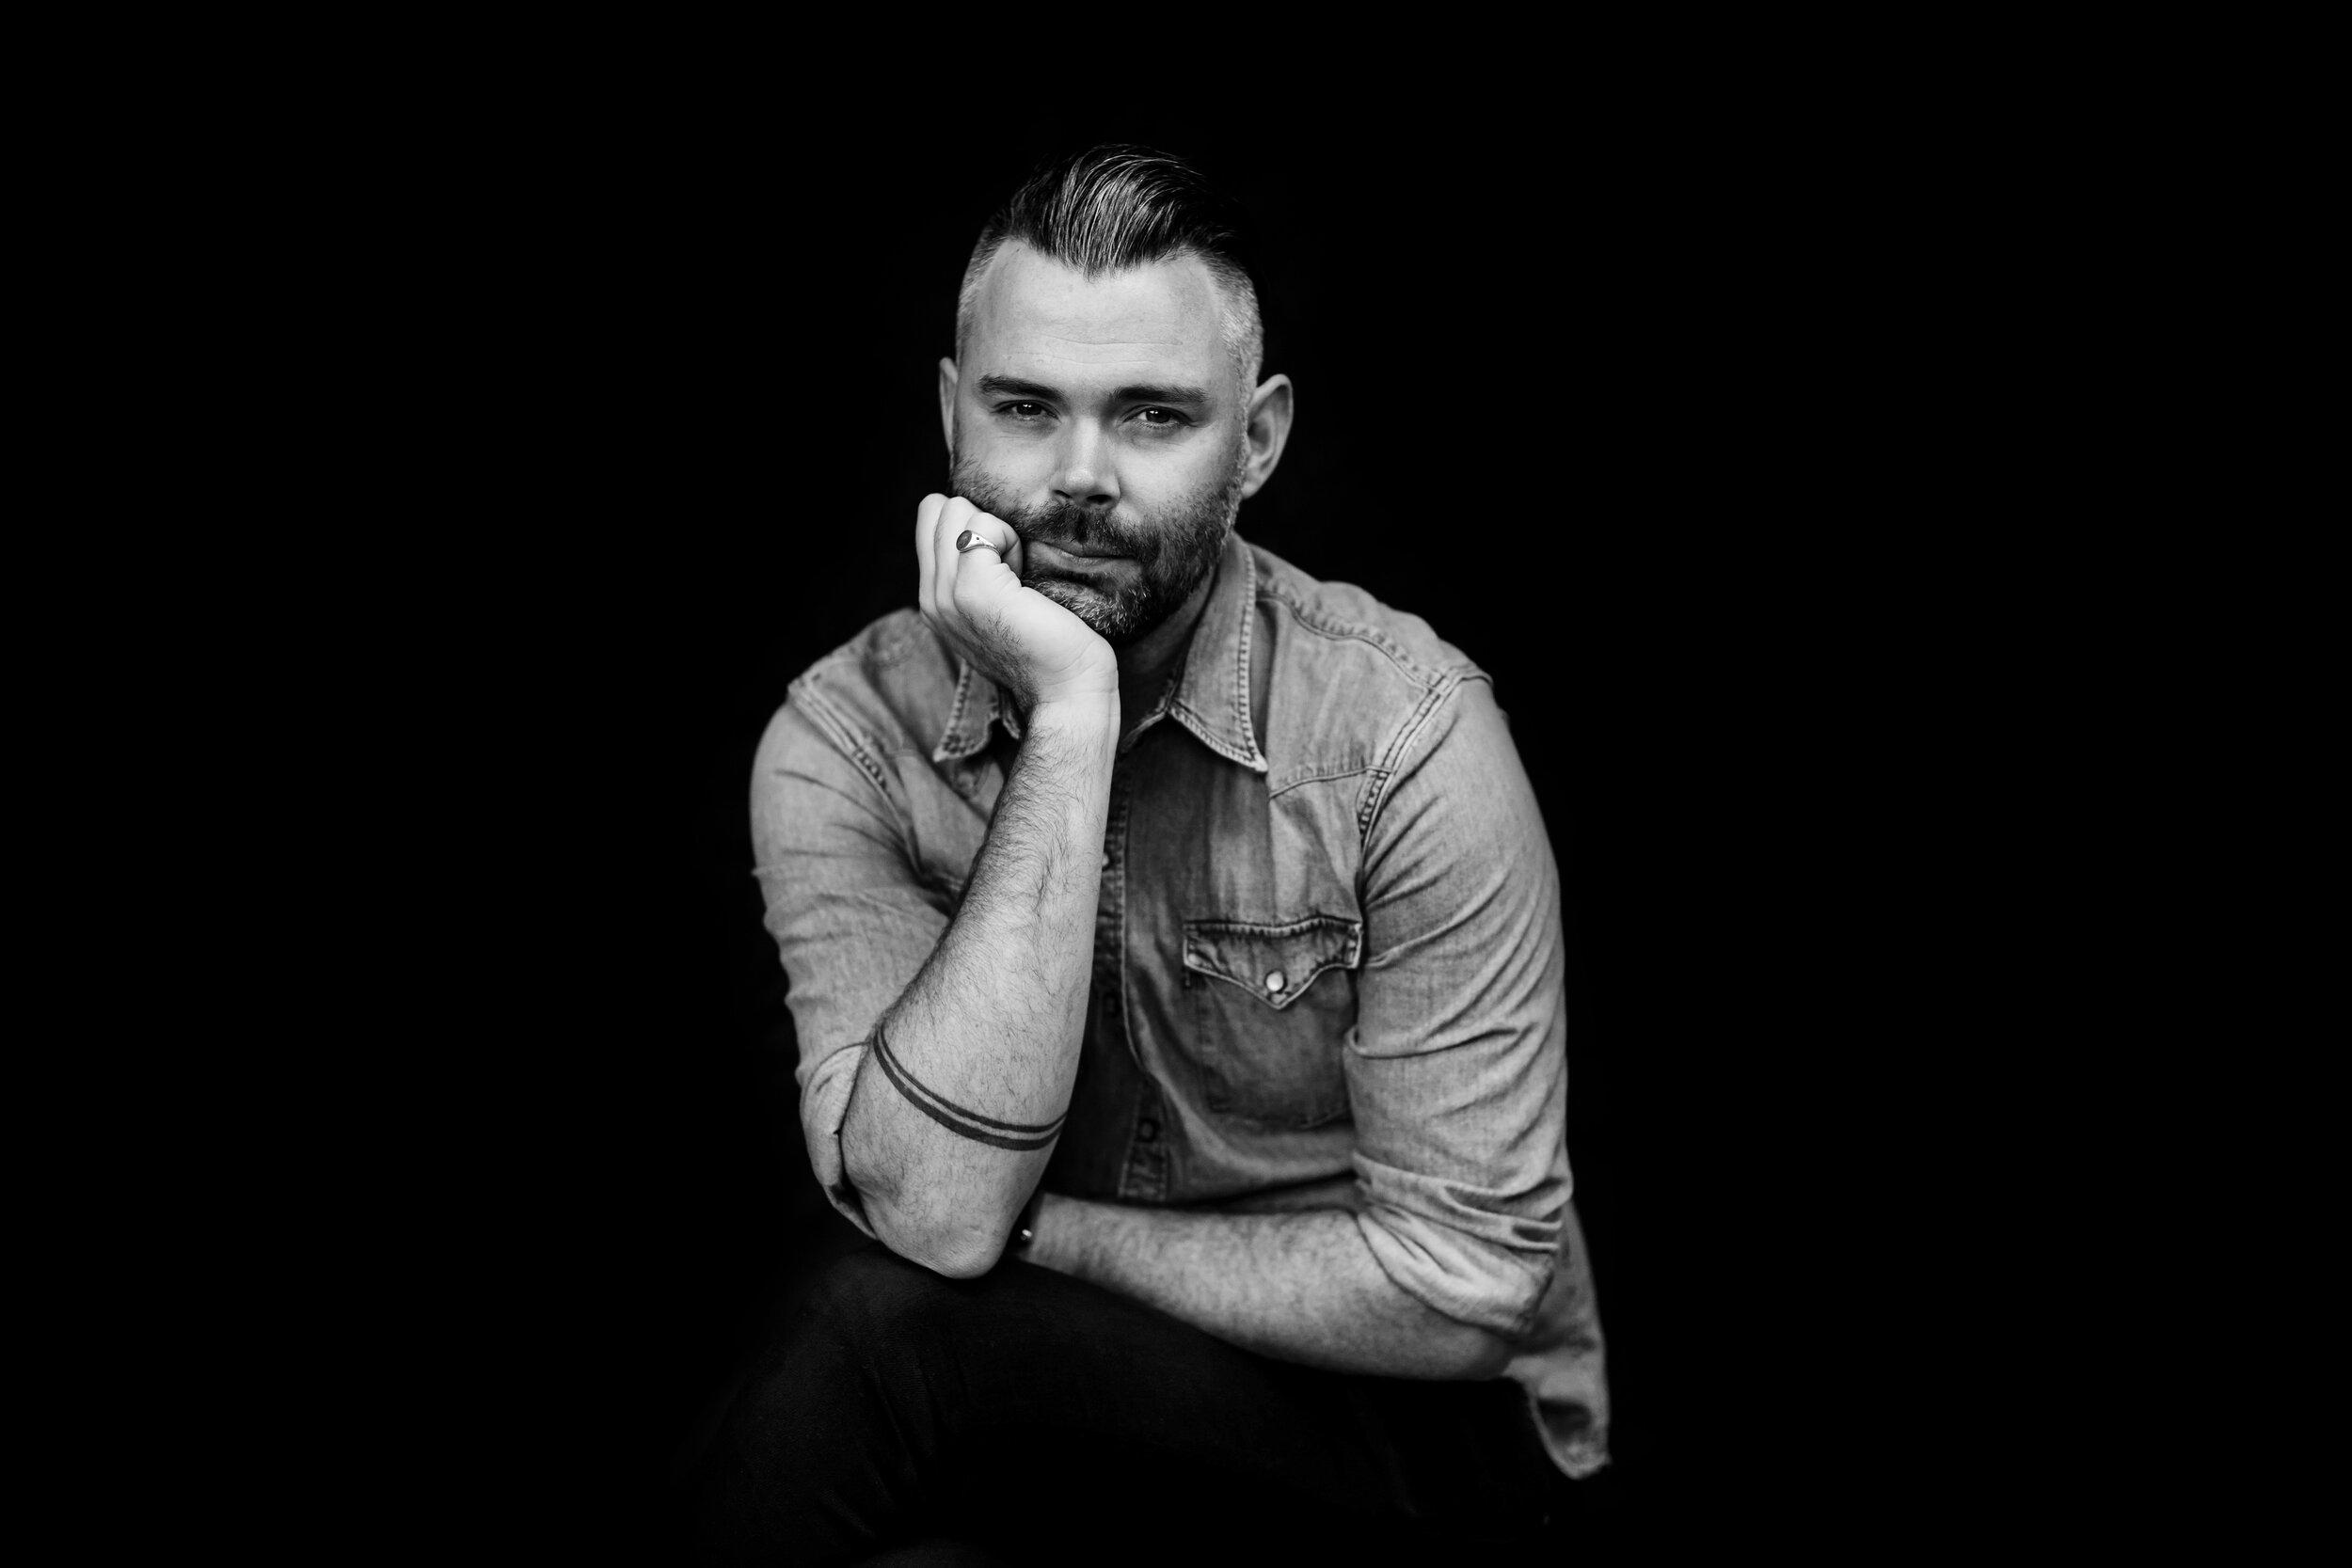 Eric Ronald - Based in Melbourne, VIC, Australia